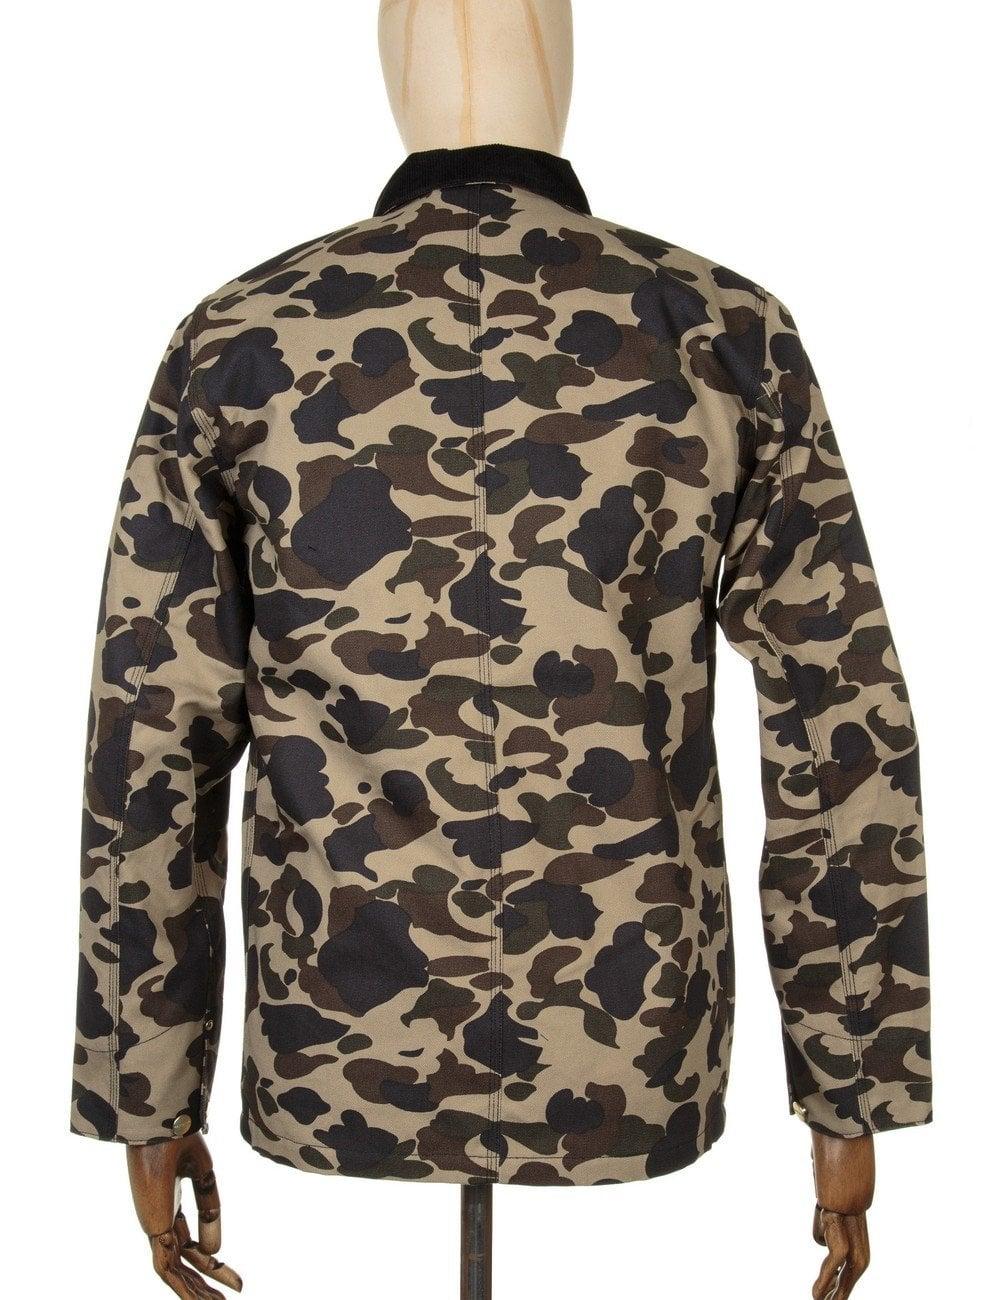 Carhartt WIP Michigan Chore Coat - Camo Duck - Clothing from Fat ... 46d261909